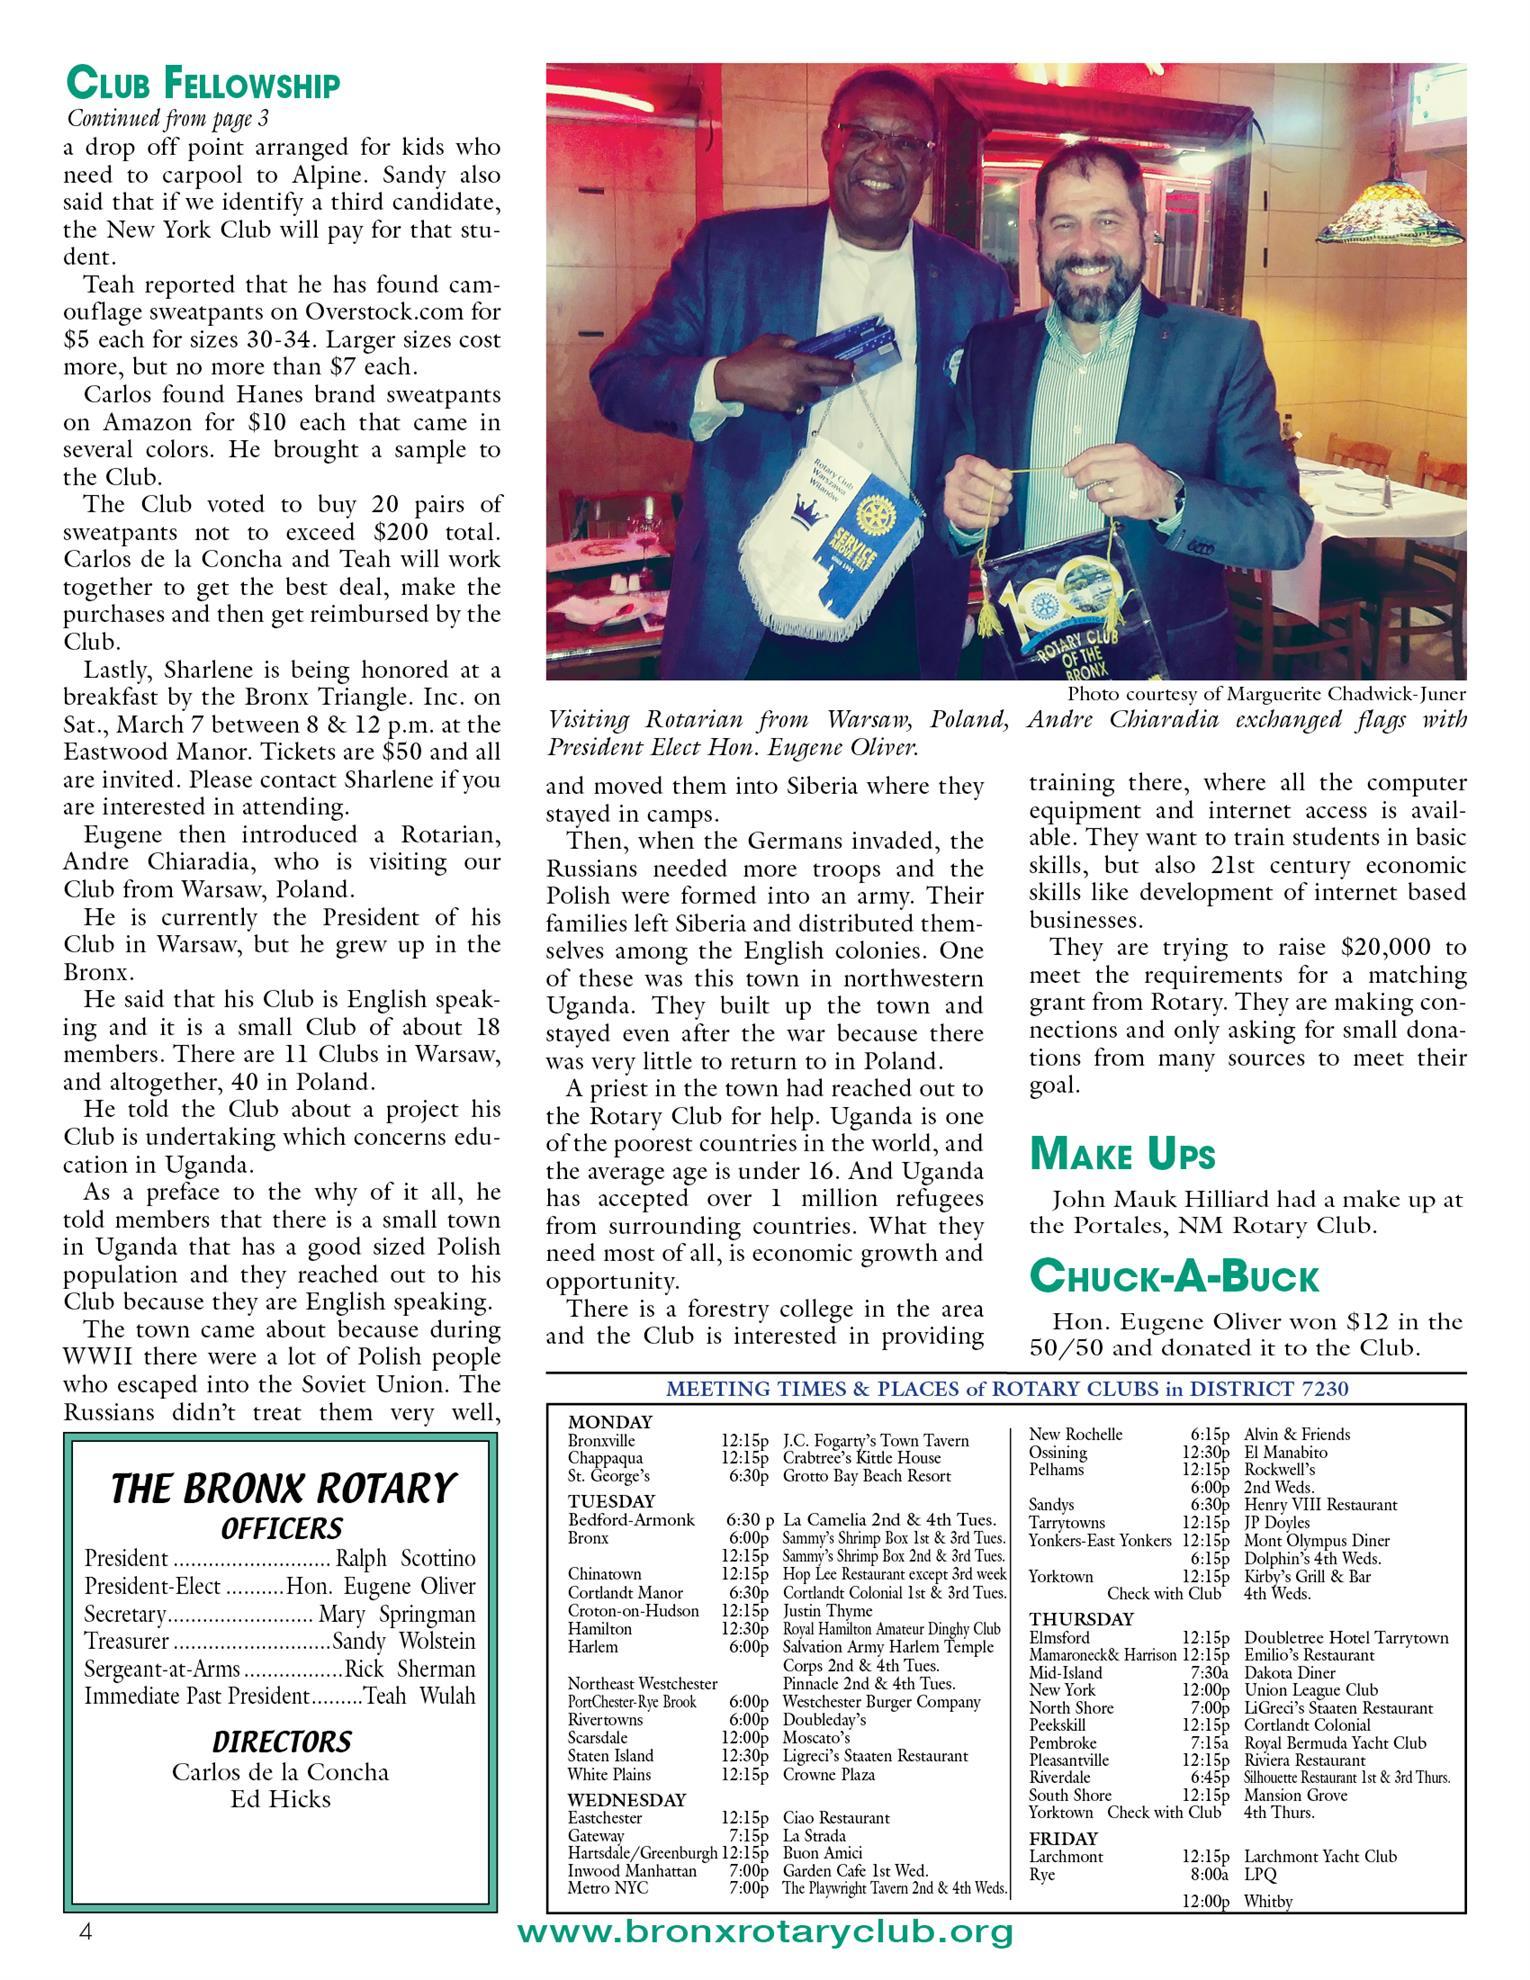 Tuesdays Newsletter 2/4, 2/11 & 2/18/2020 p4